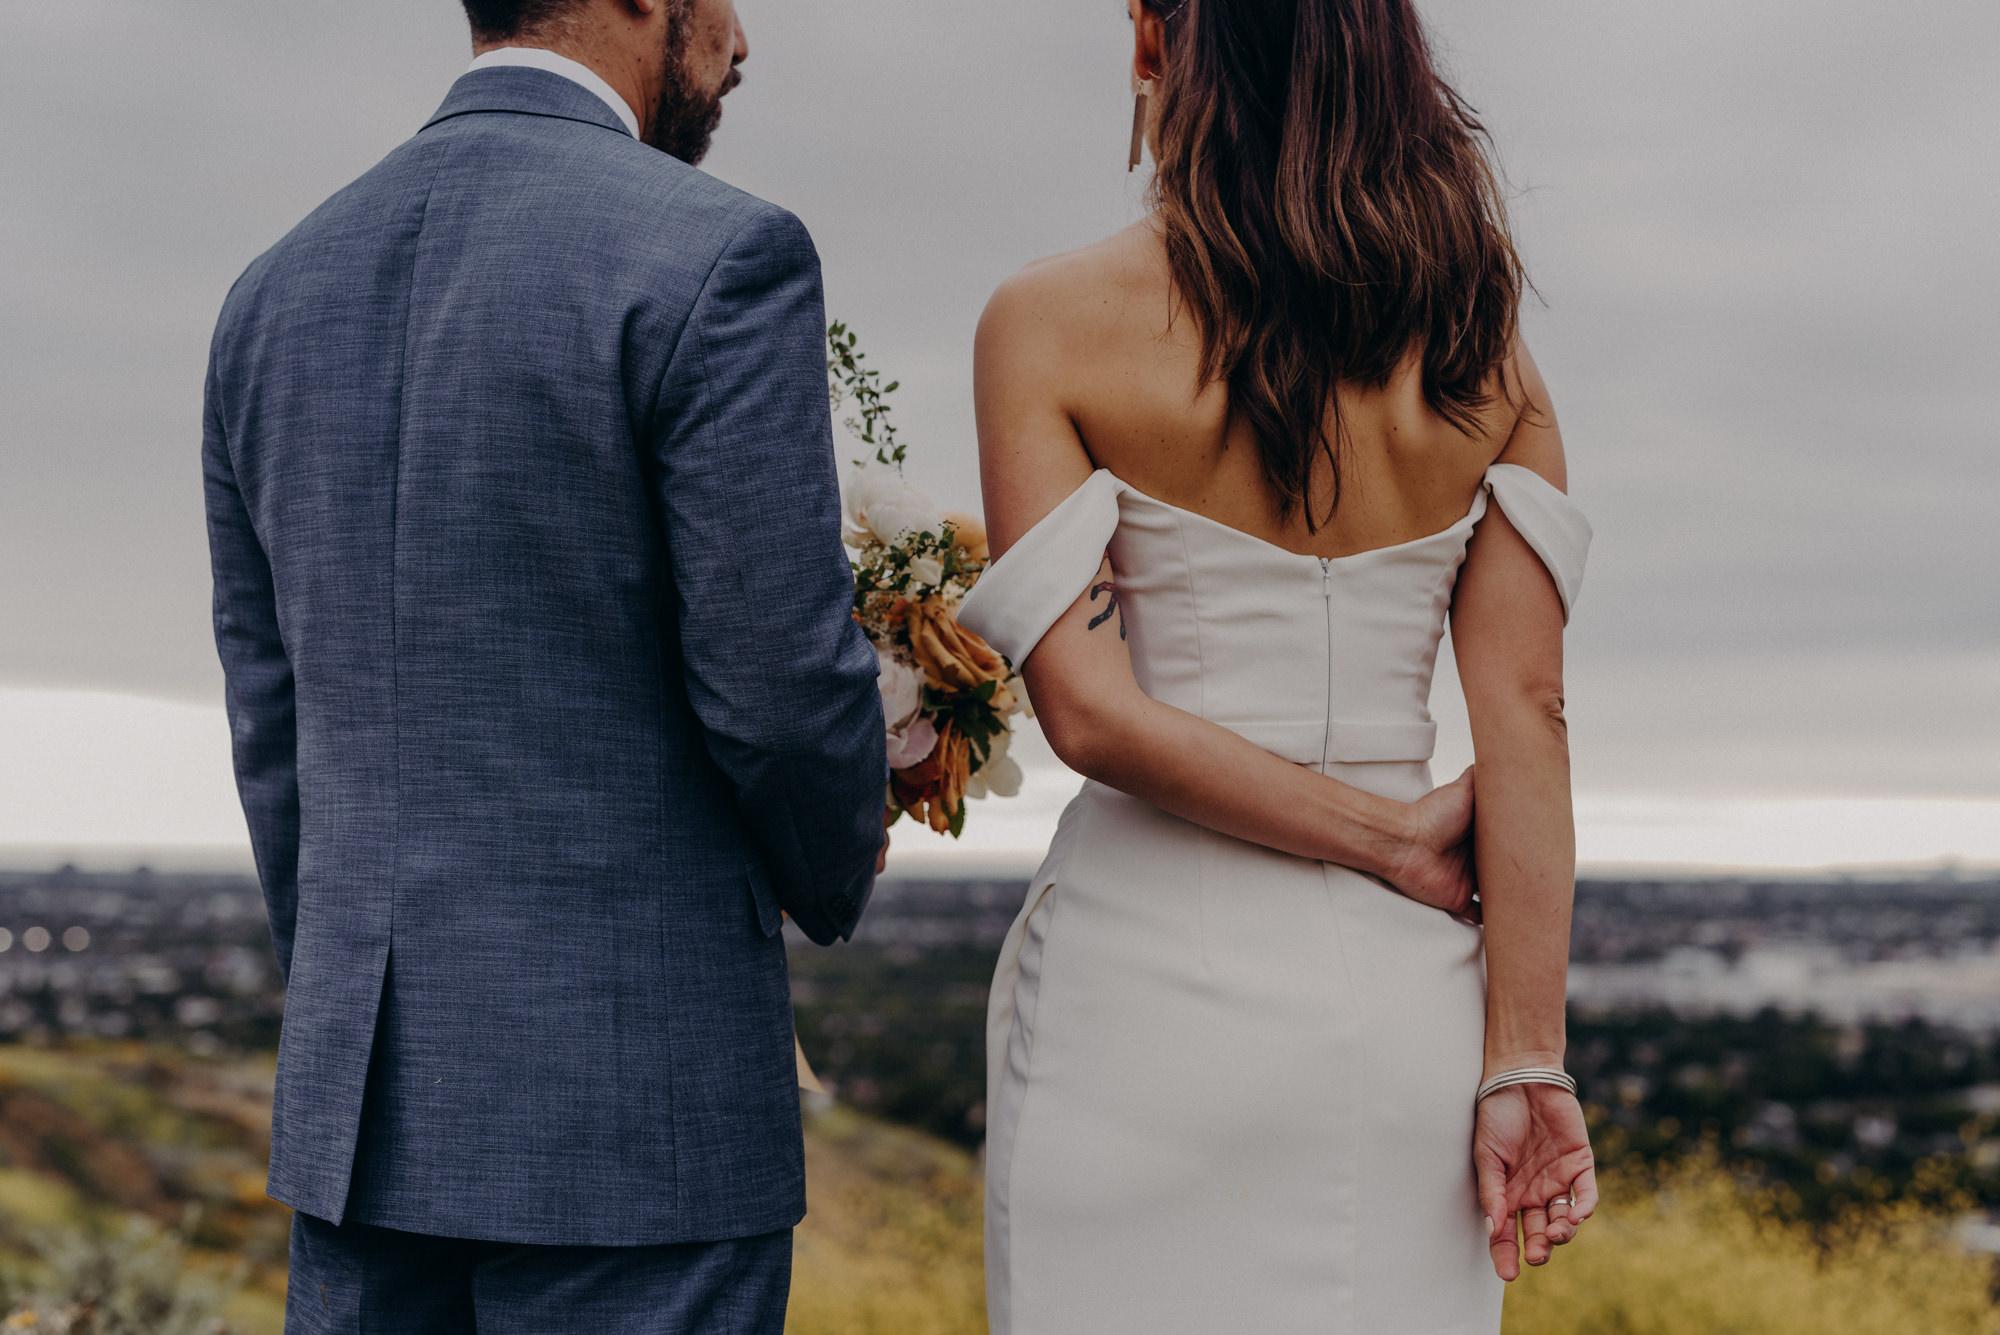 elopement photographer in los angeles - la wedding photographer - isaiahandtaylor.com-038.jpg